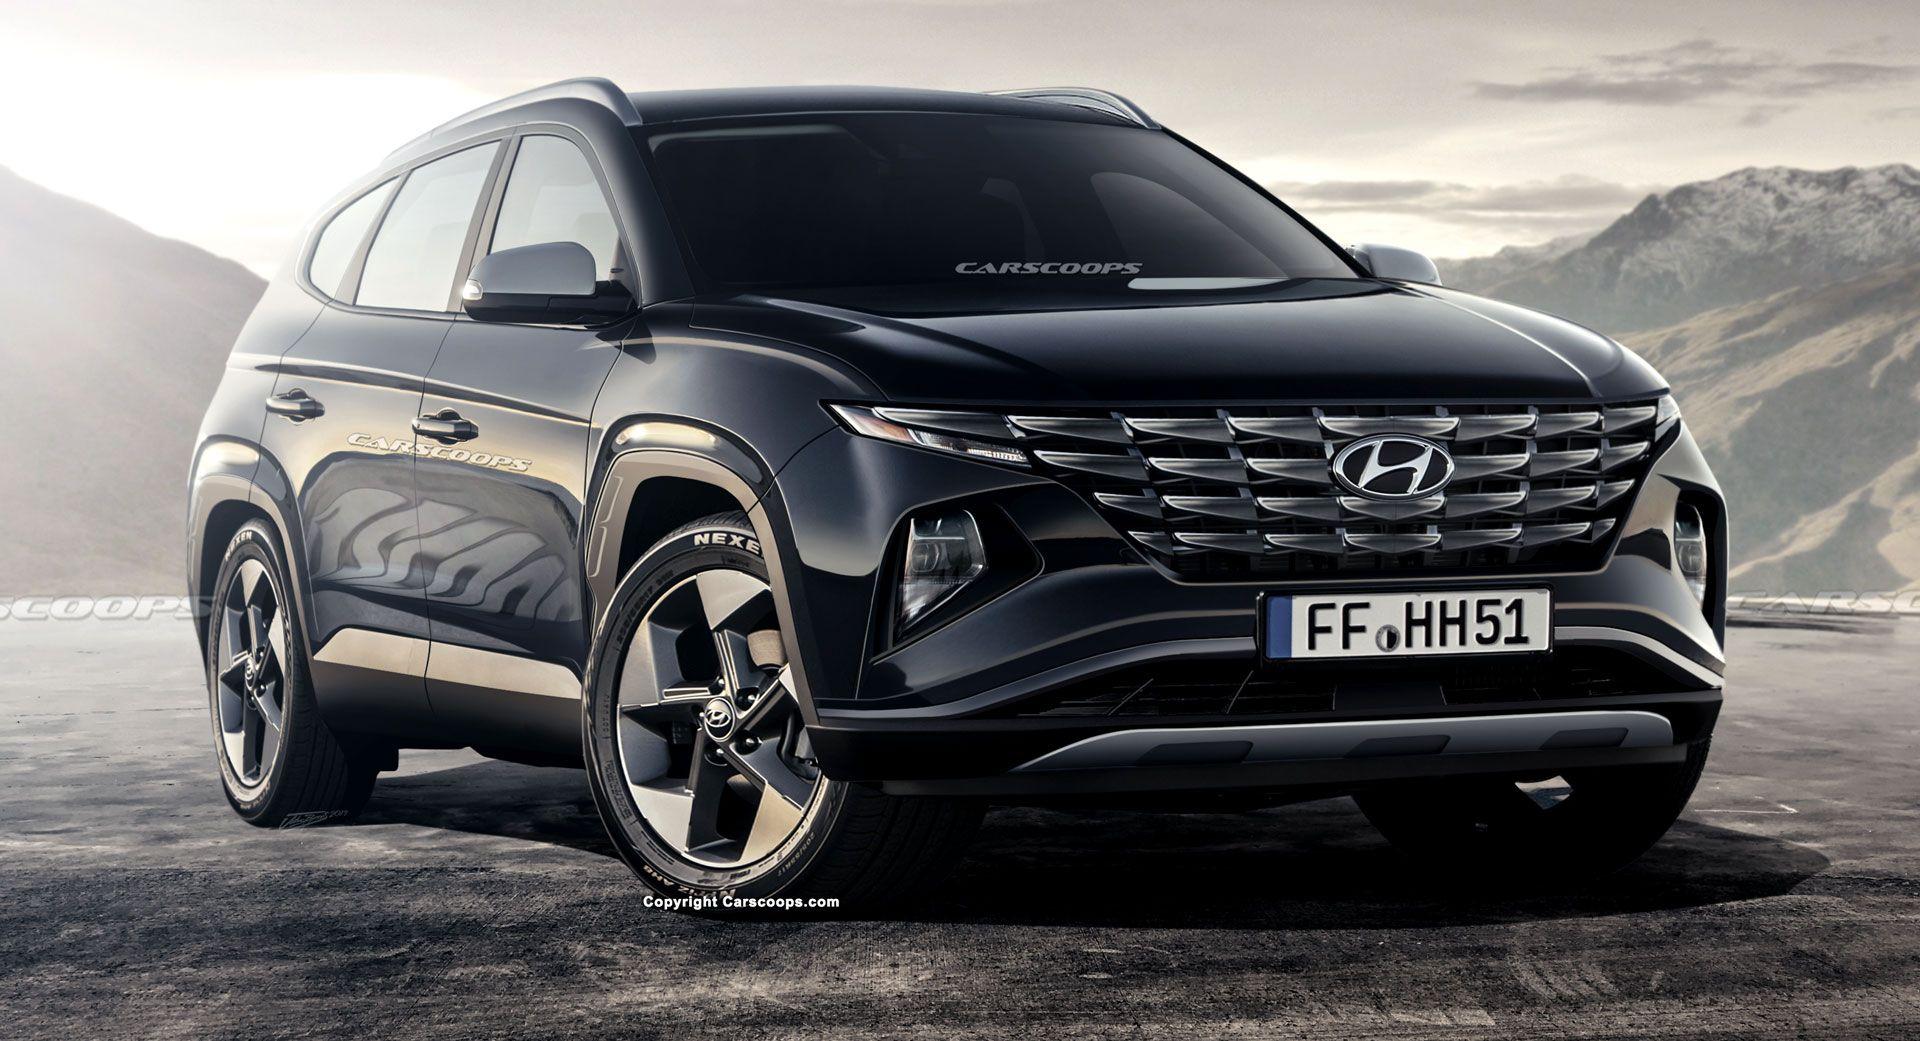 Future Cars Archives Carscoops In 2020 Hyundai Tucson New Hyundai Hyundai